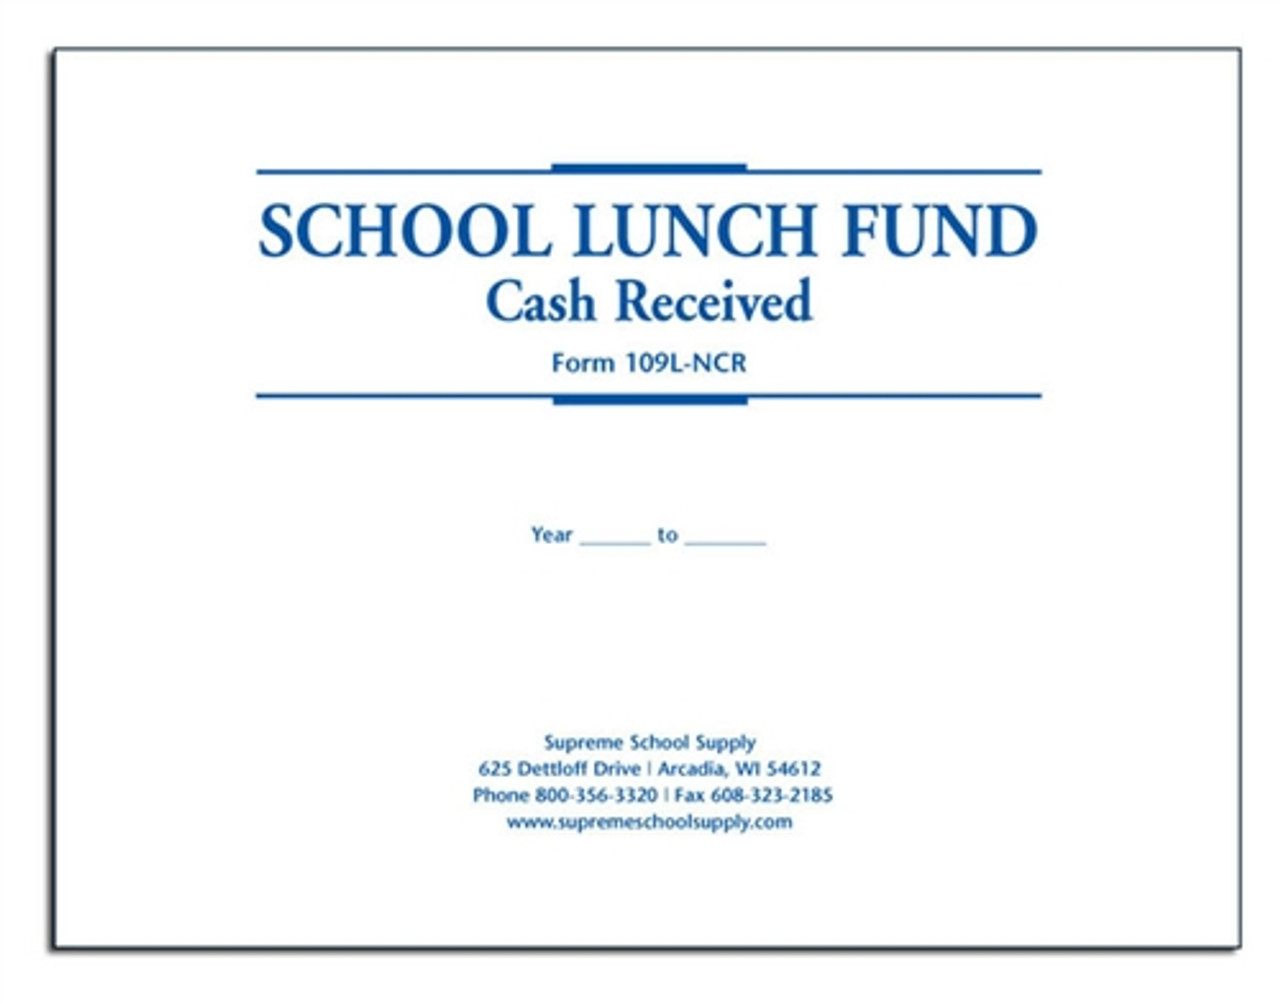 School Lunch Fund Receipts Cash Received (109L-NCR)